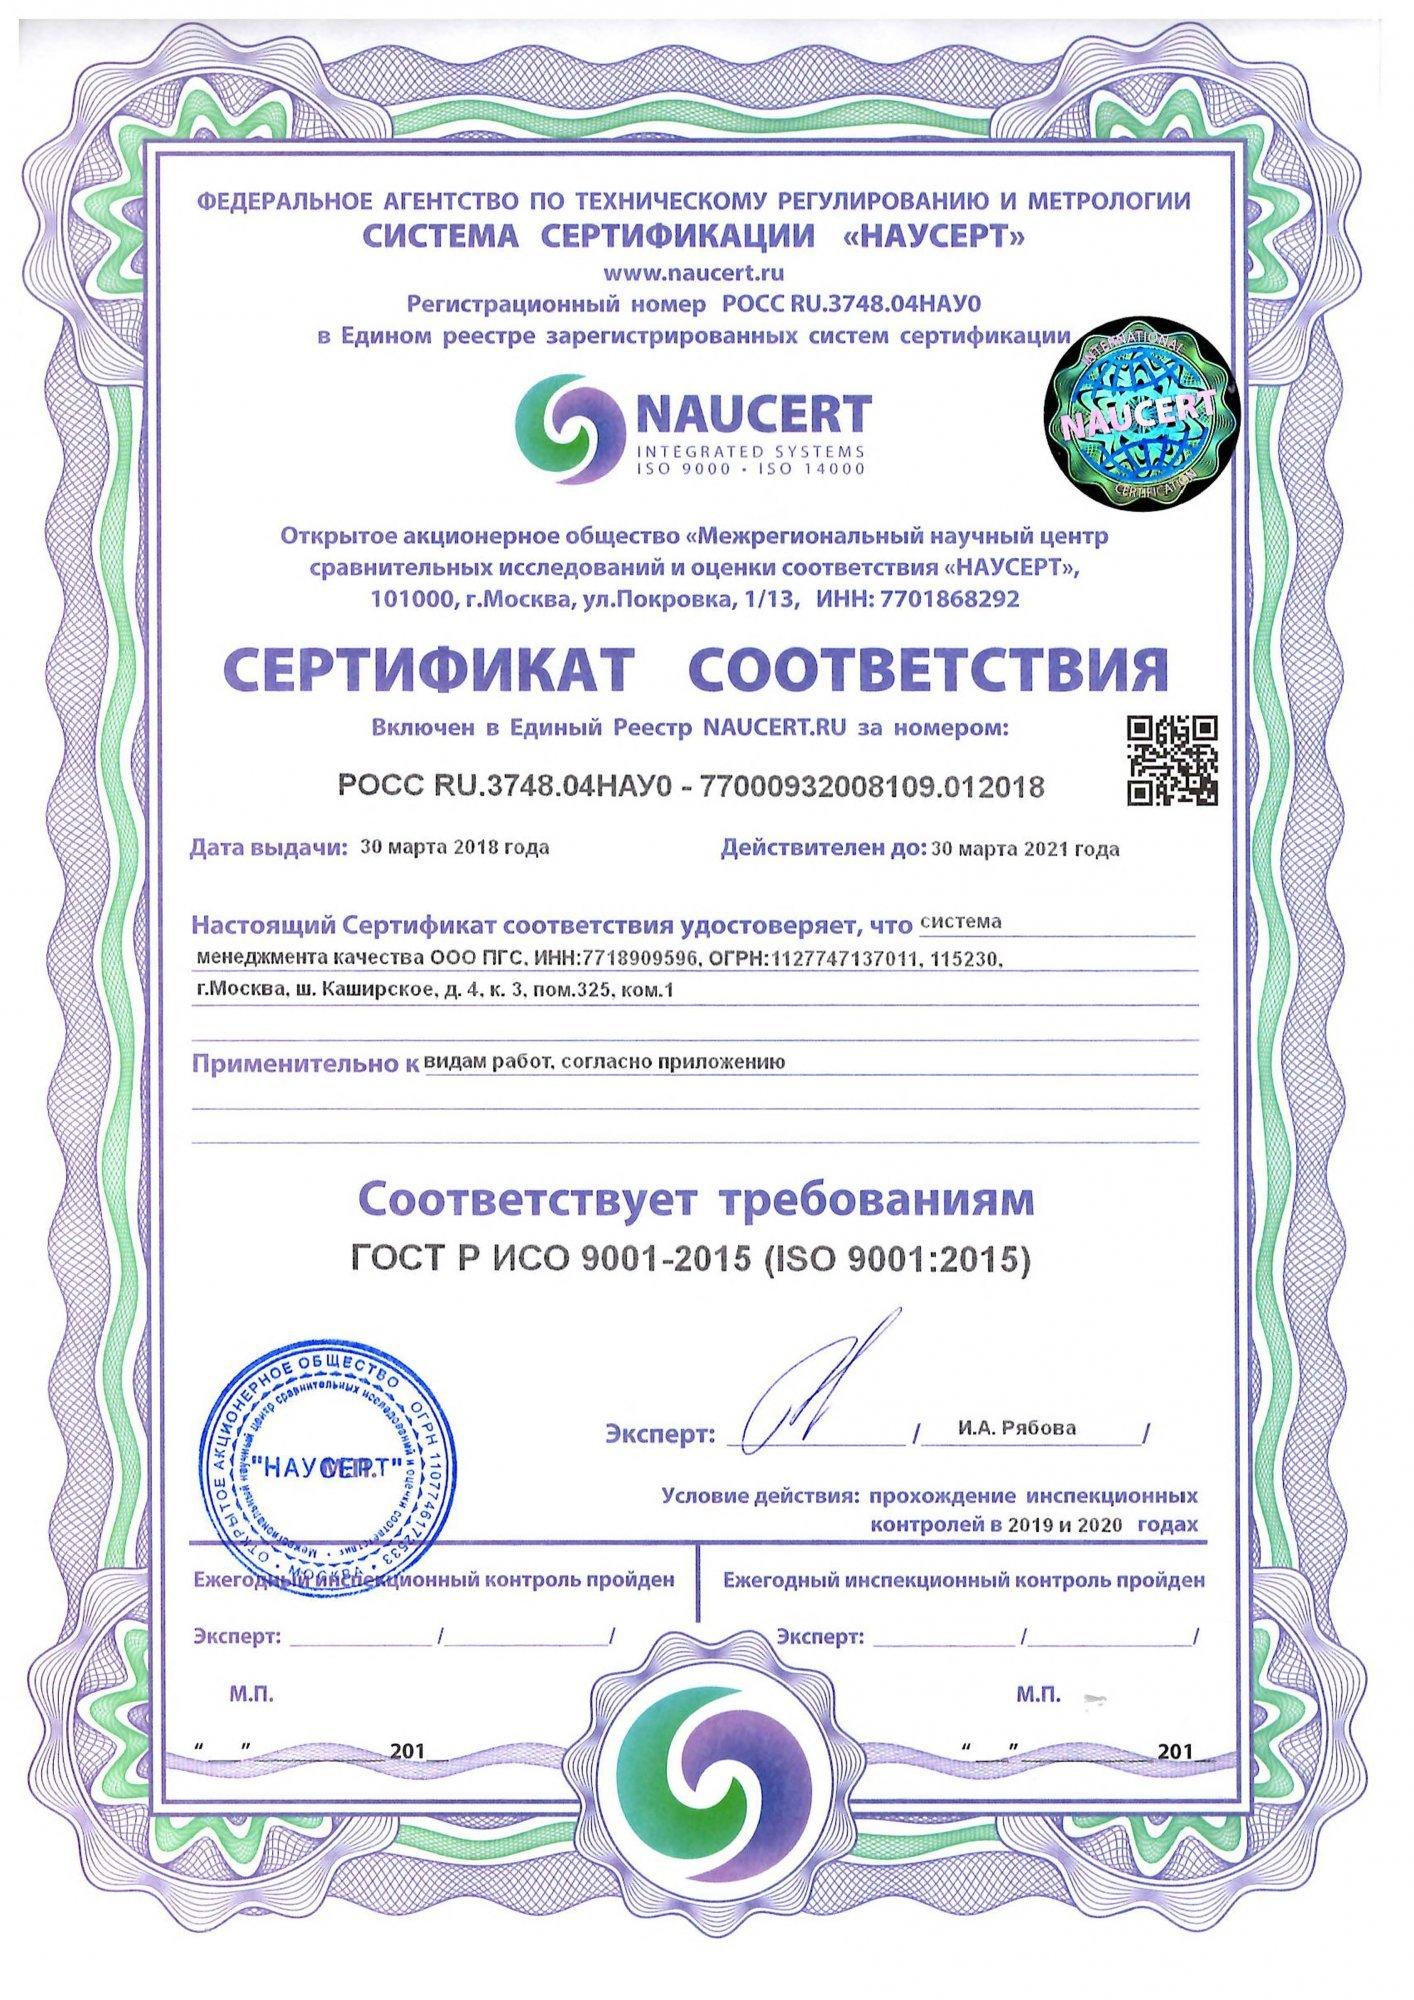 Обновлён сертификат соответствия стандартам ГОСТ ISO